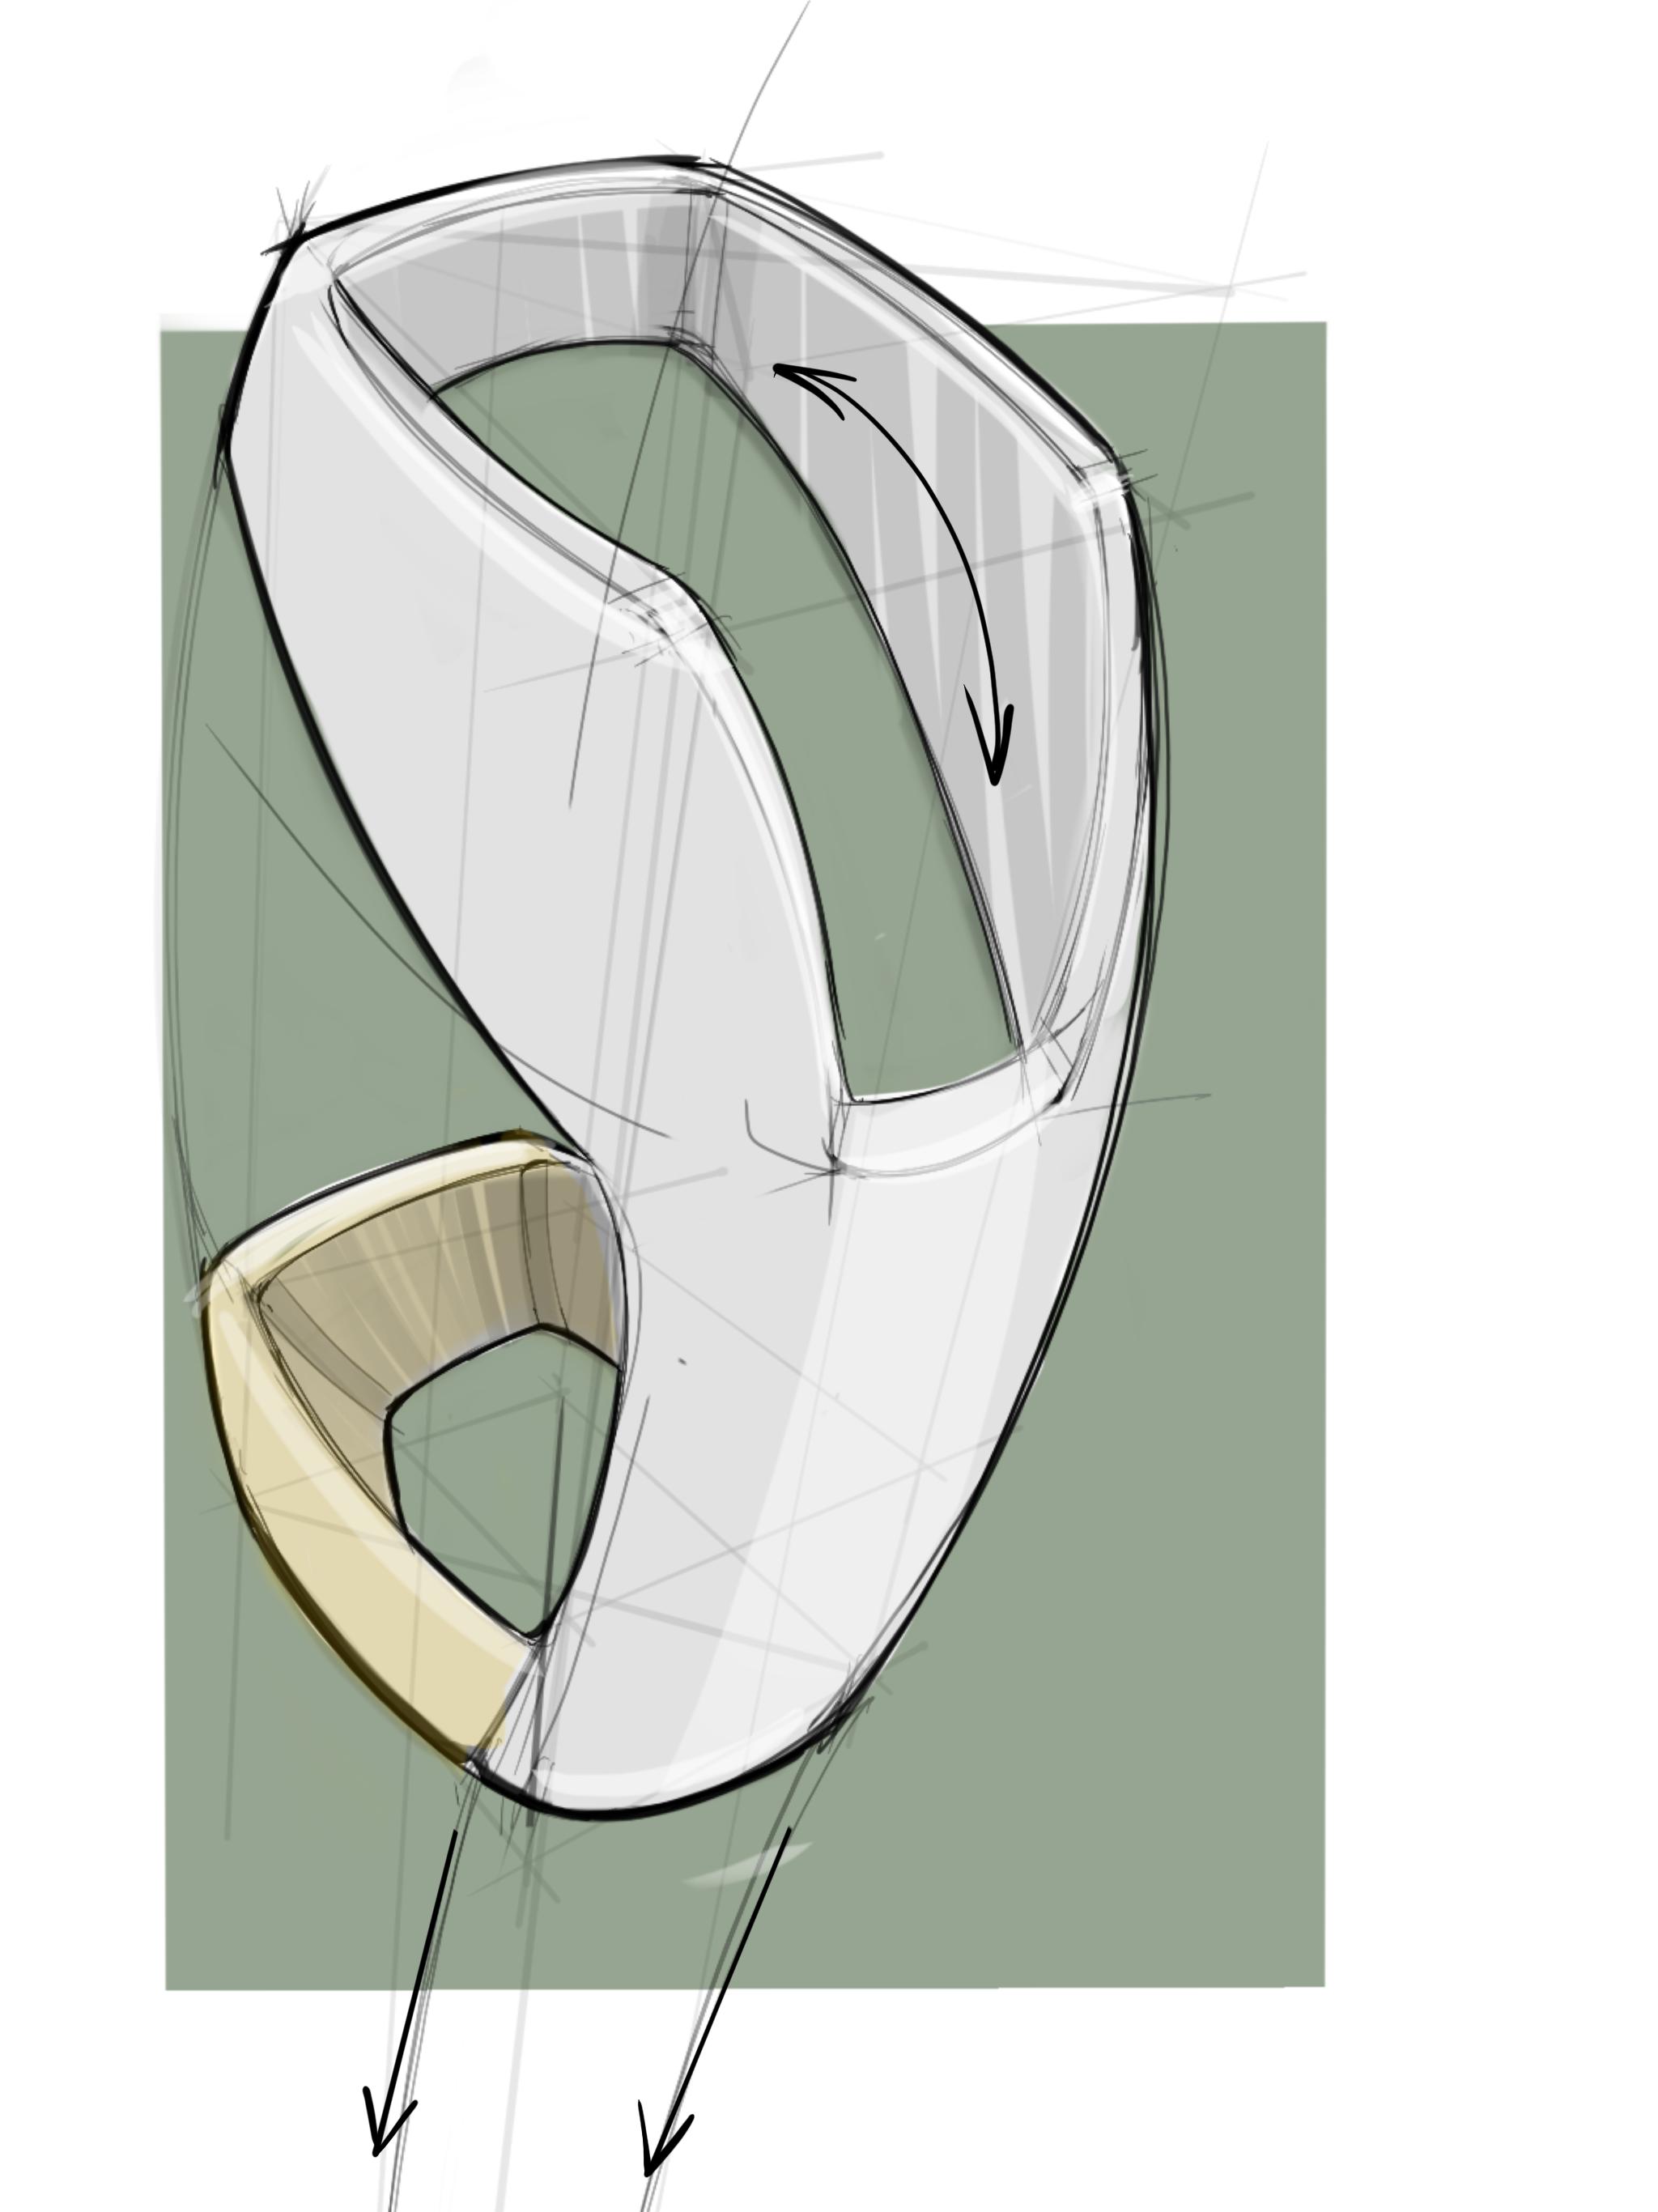 Qiu_Residual Limb.PNG